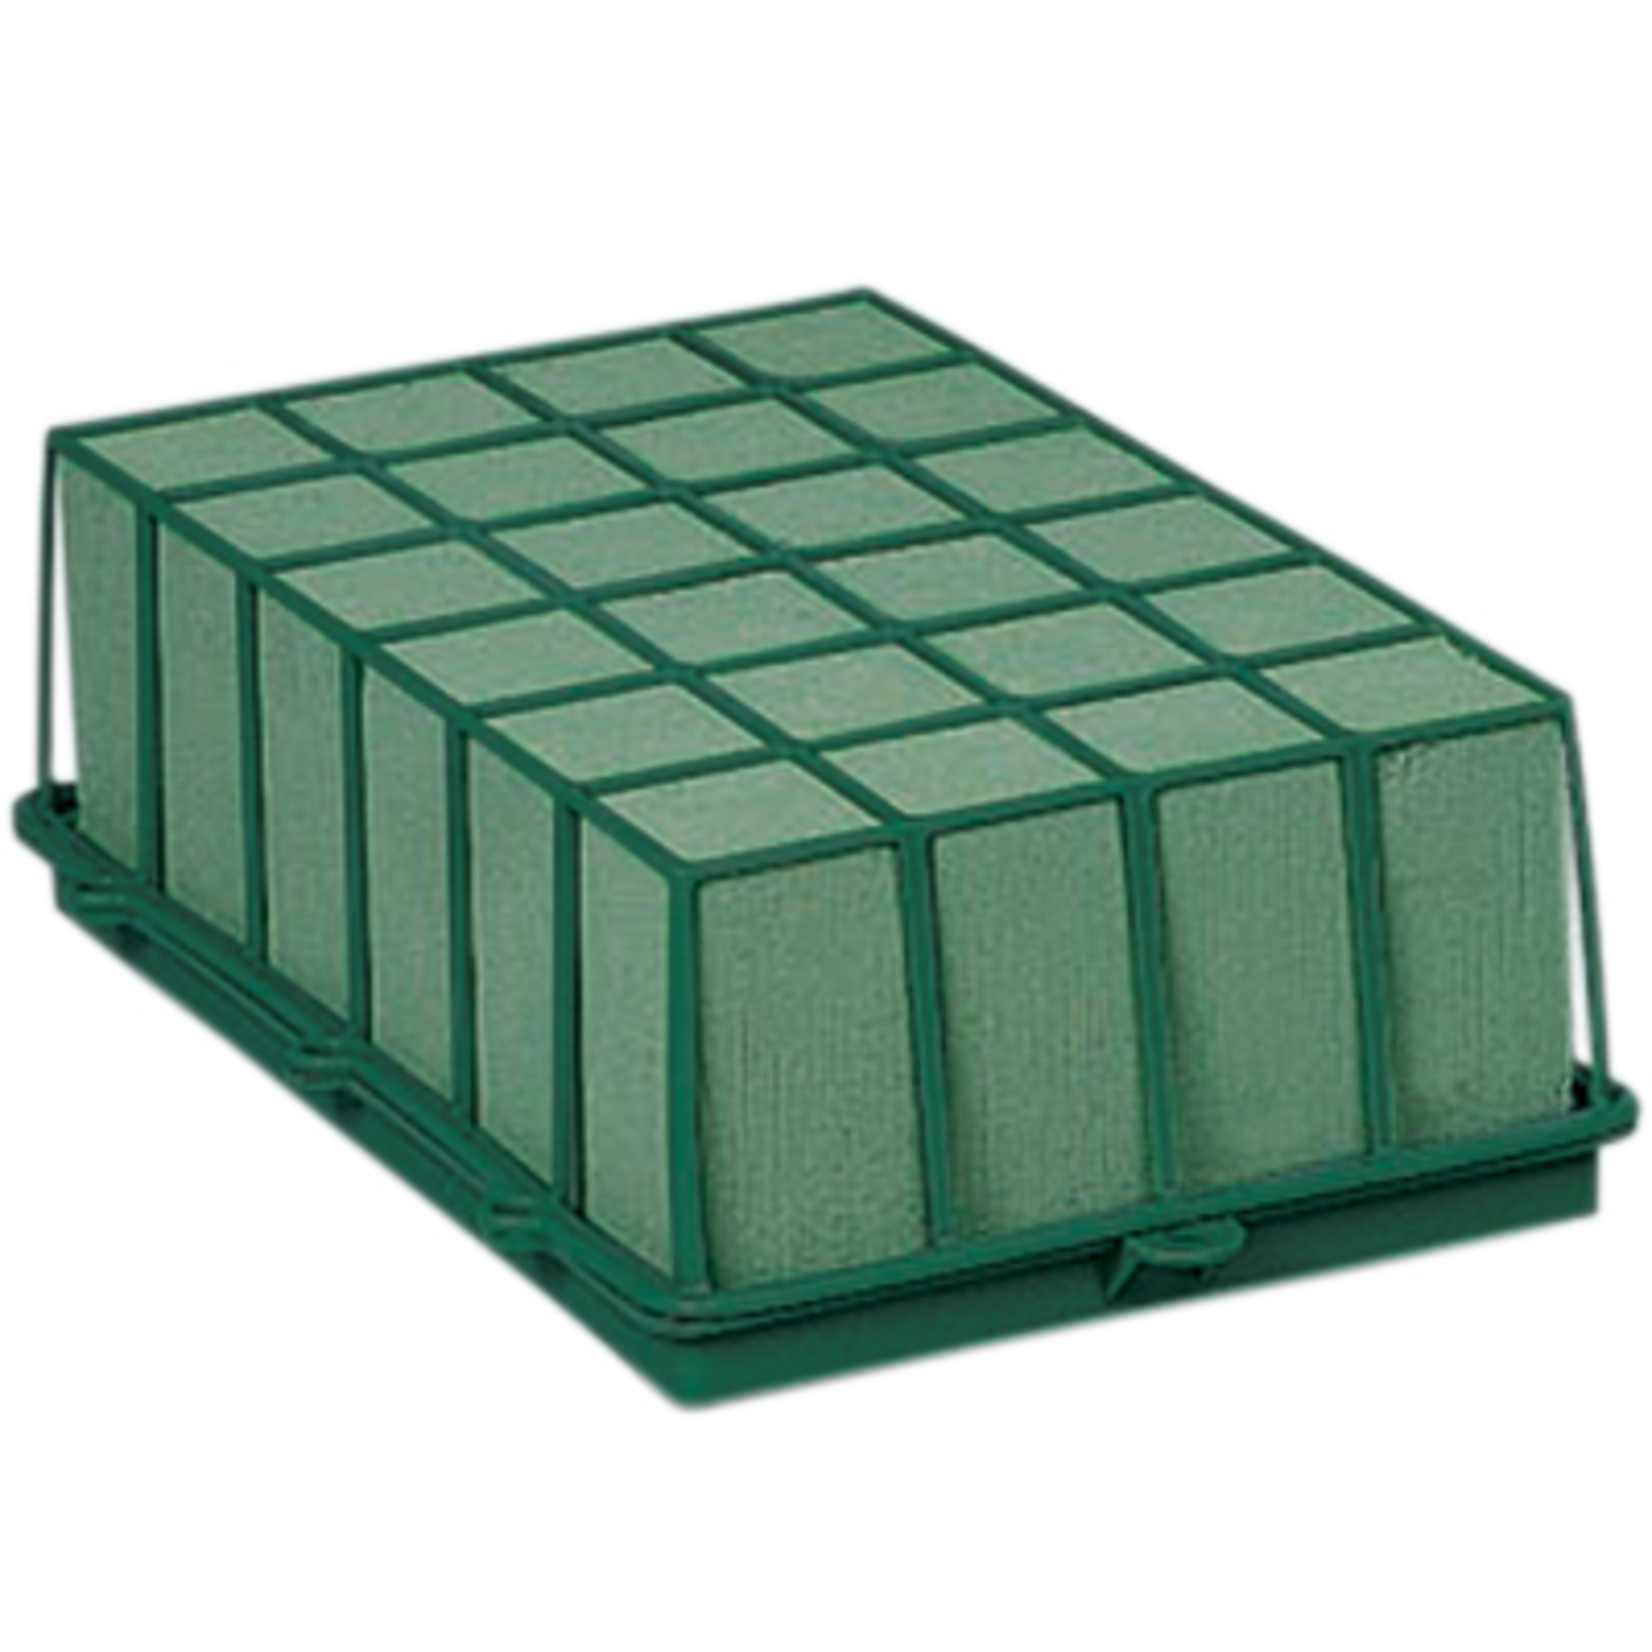 1 2/3 Brick Cage with Aquafoam - Green